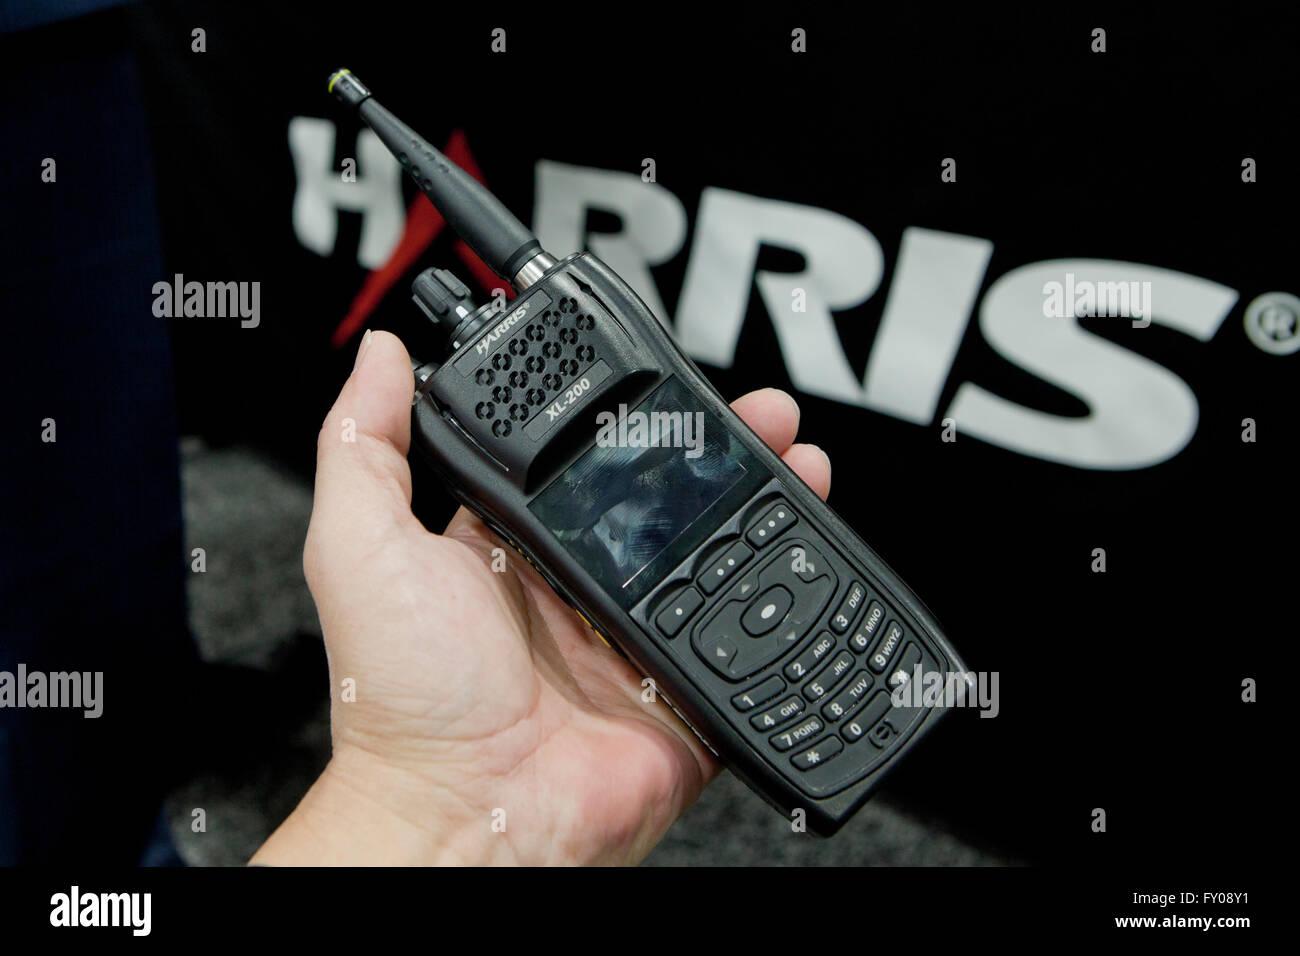 Harris XL-200P handheld radio - USA - Stock Image